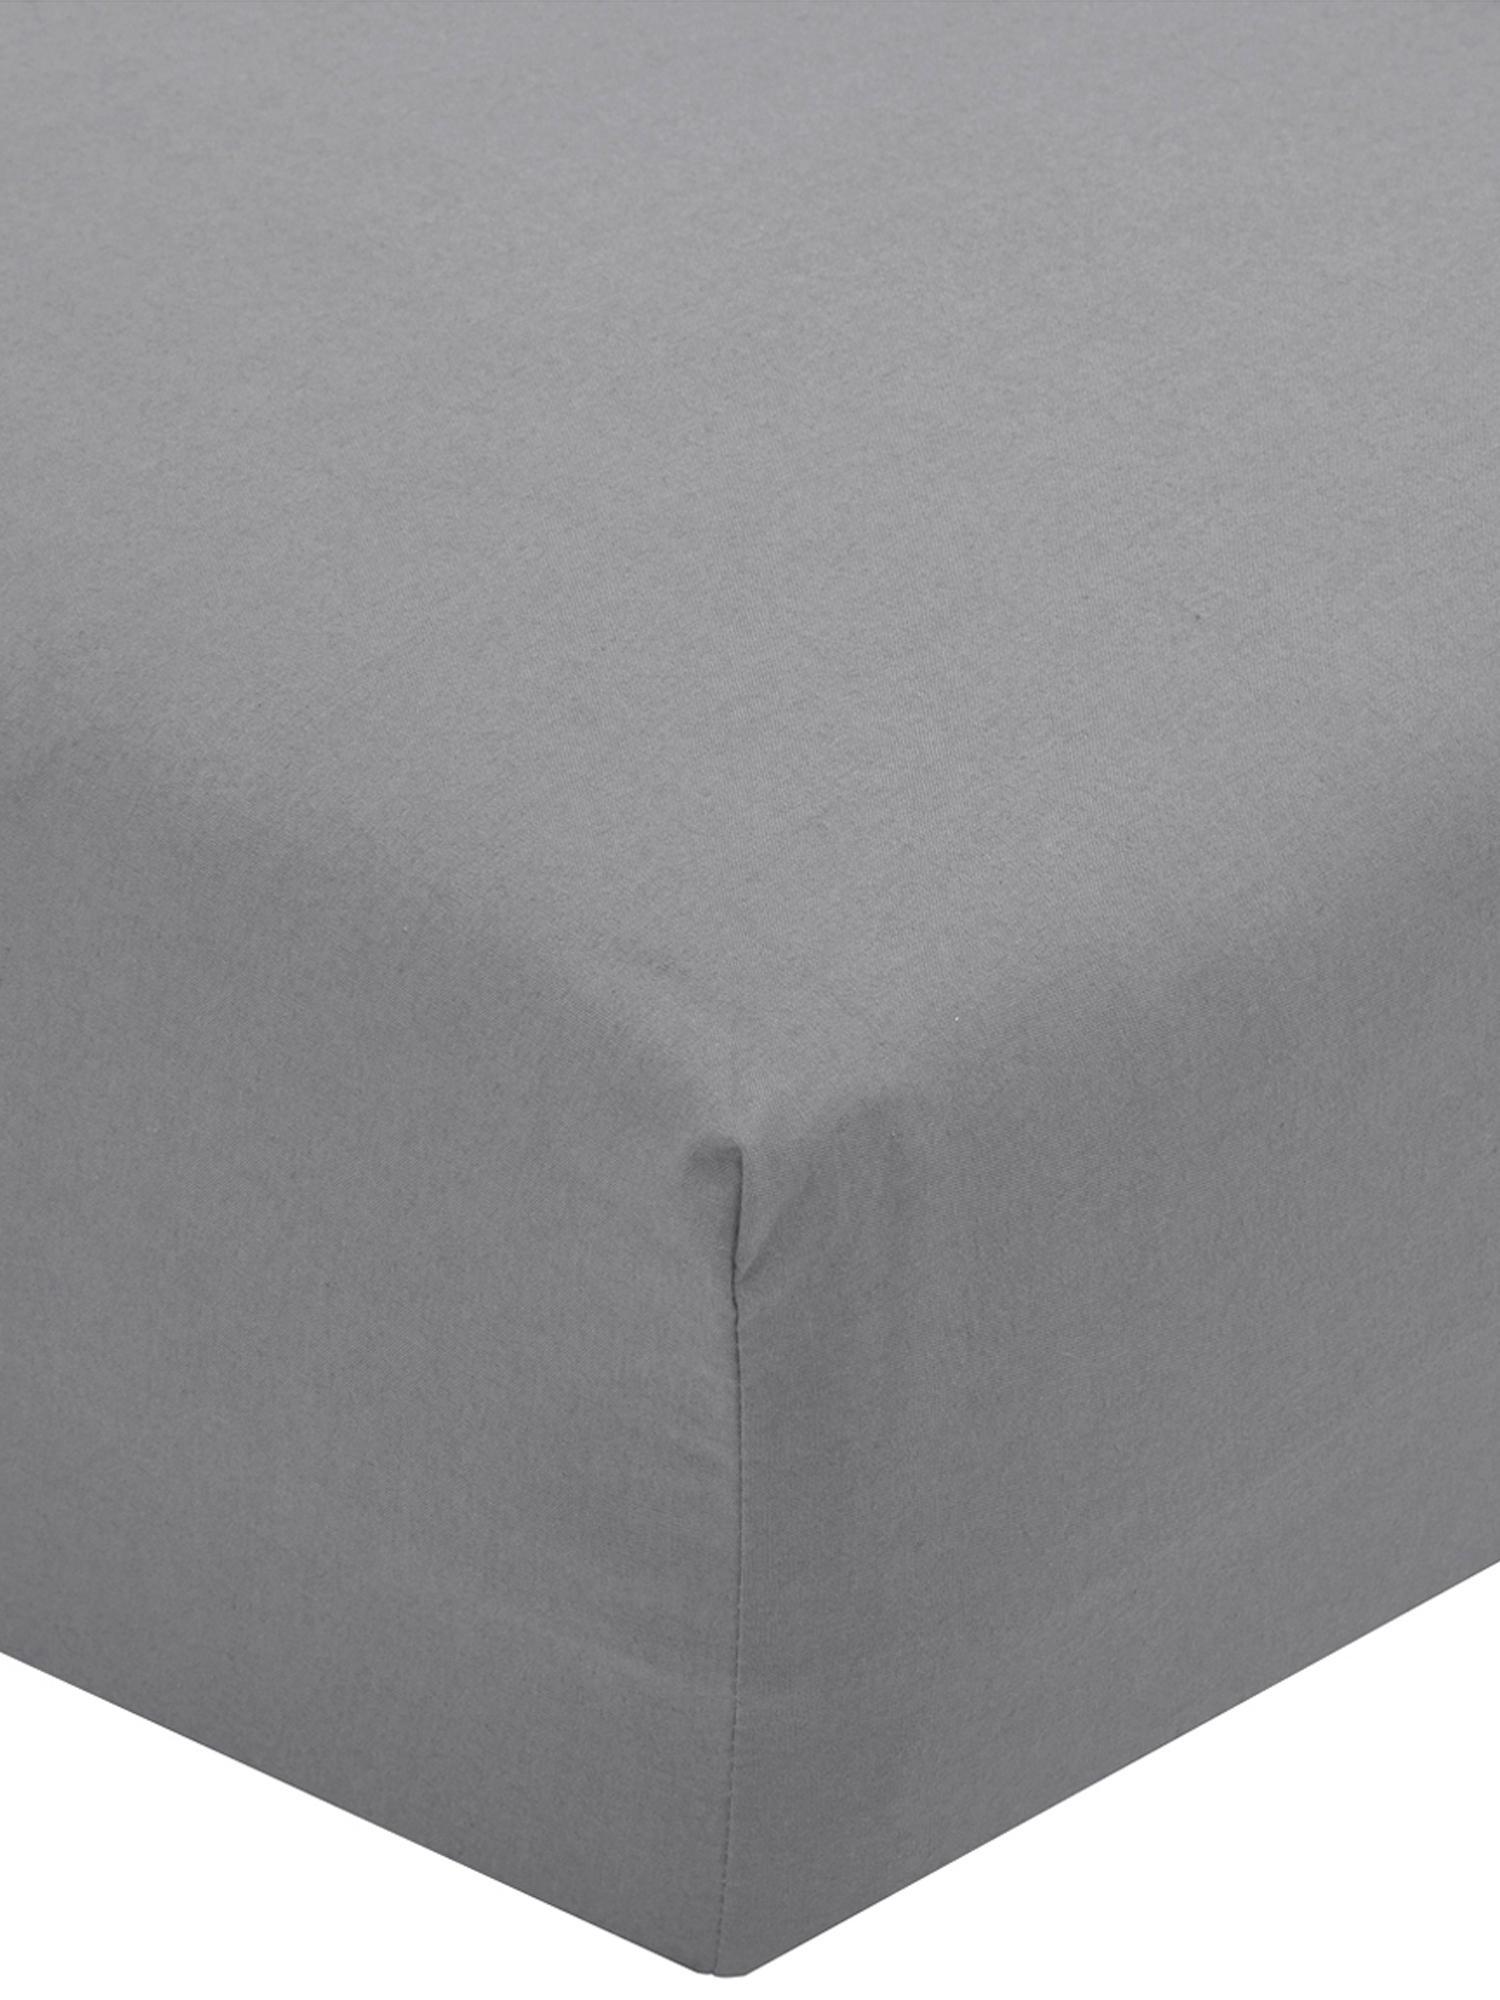 Sábana bajera de percal Elsie, Gris oscuro, Cama 150 cm (160 x 200 cm)